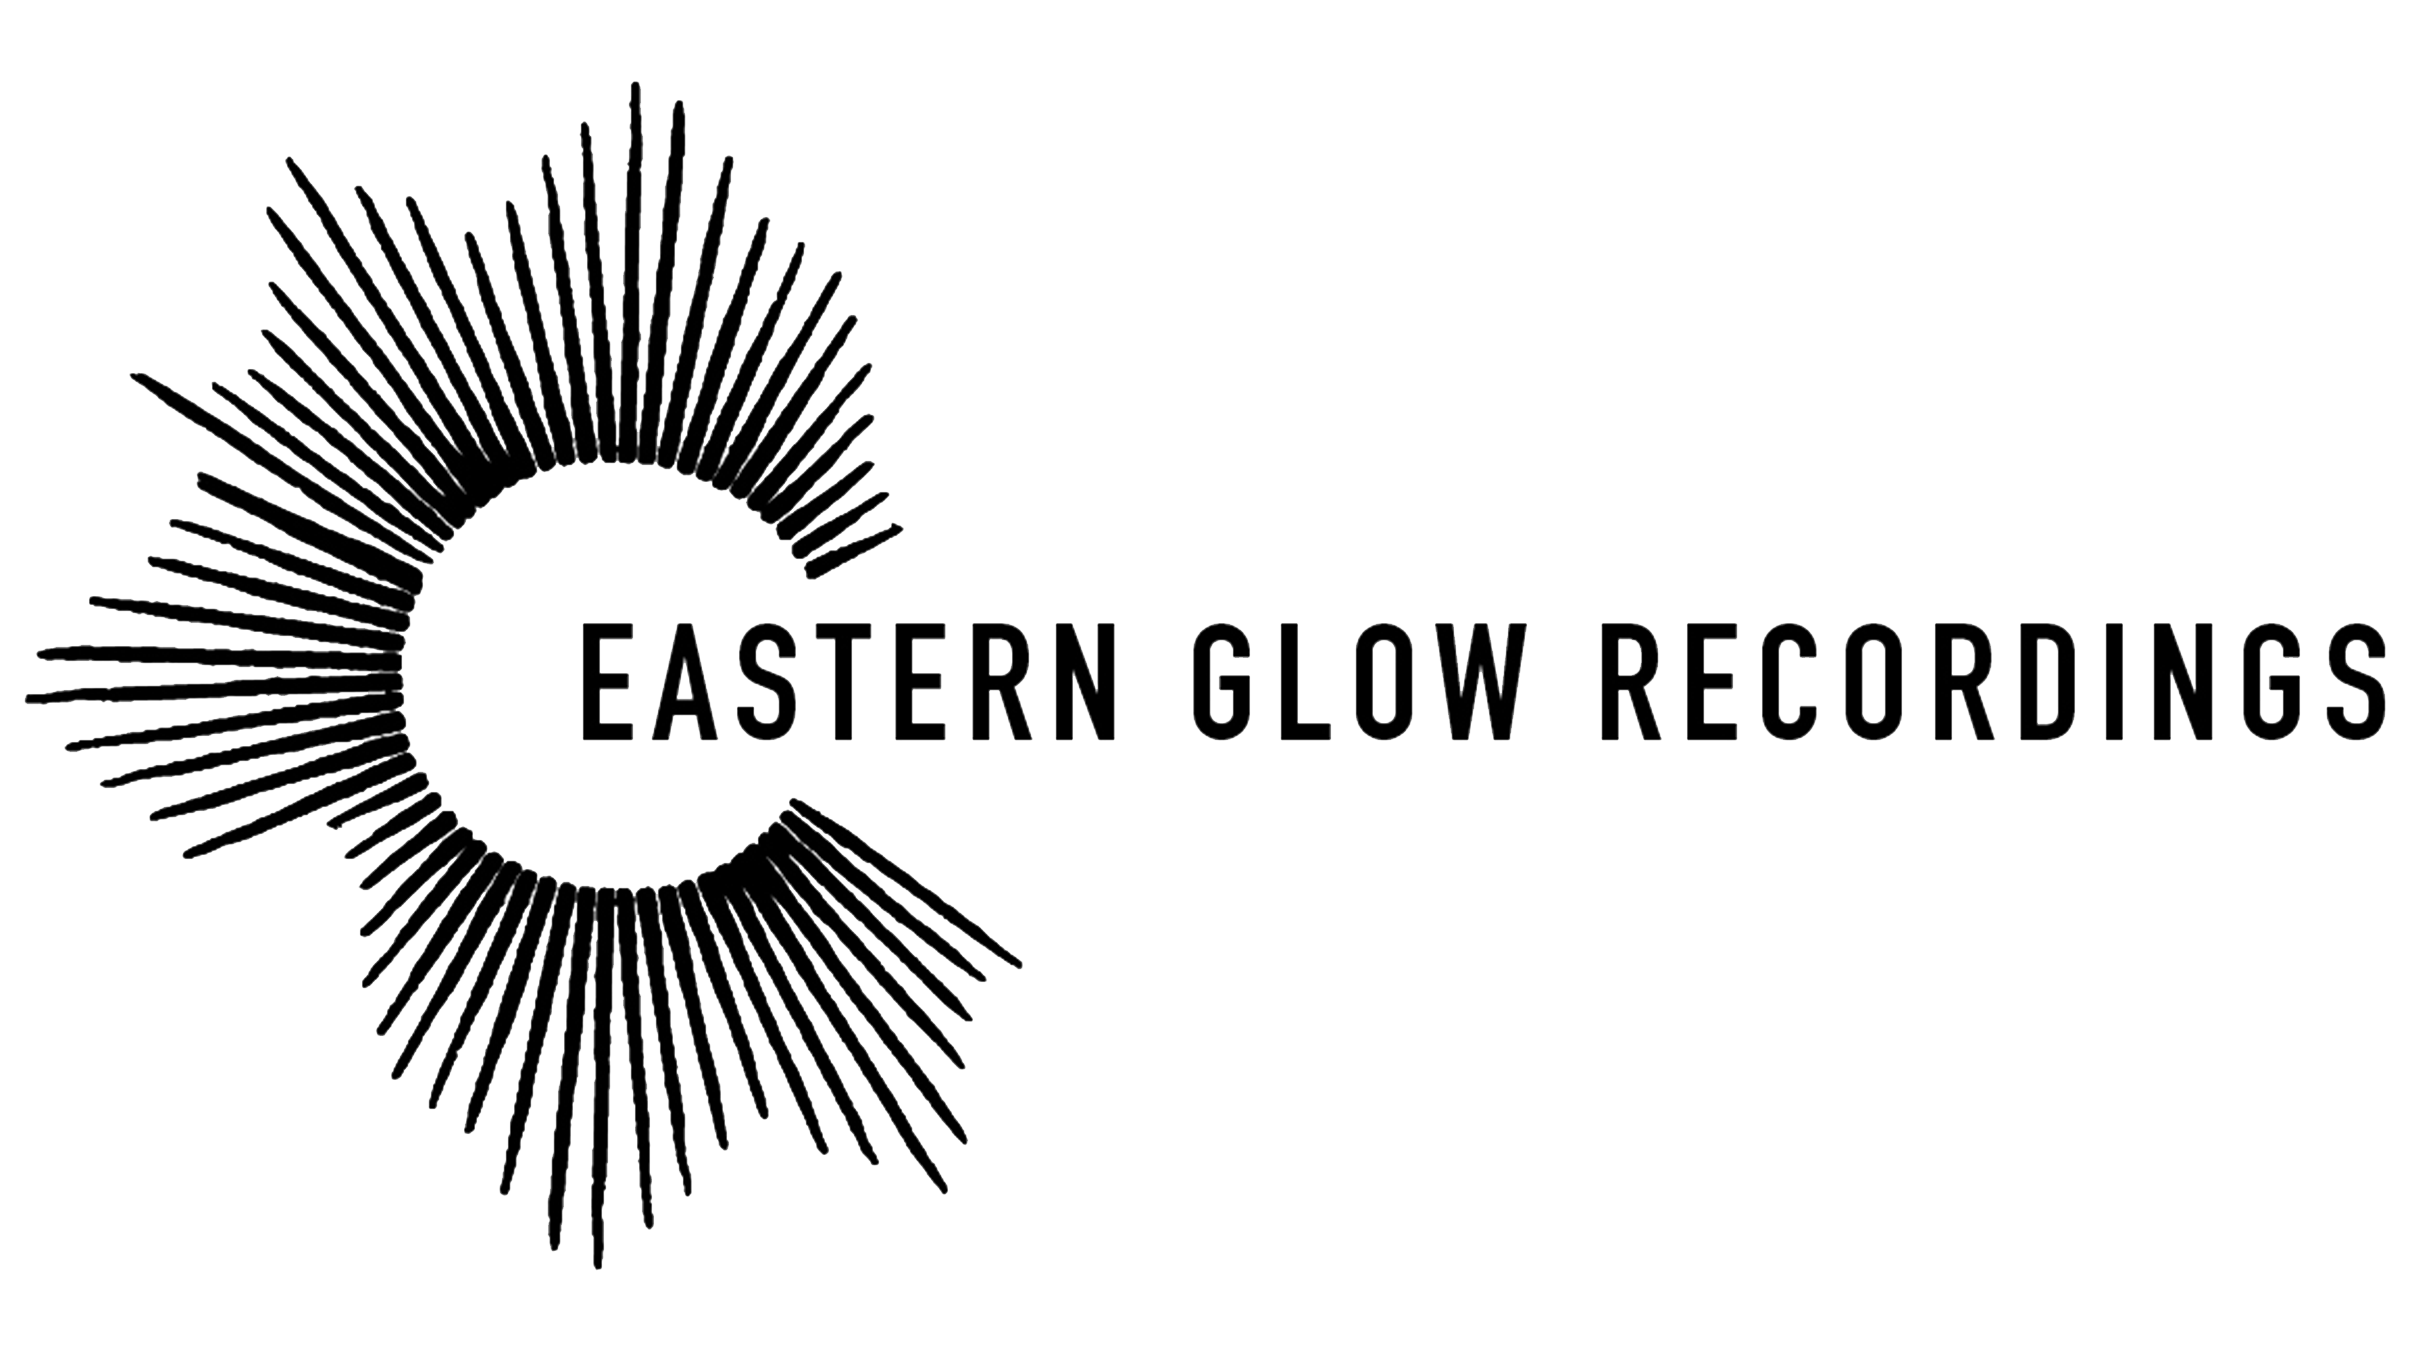 Eastern Glow Recordings